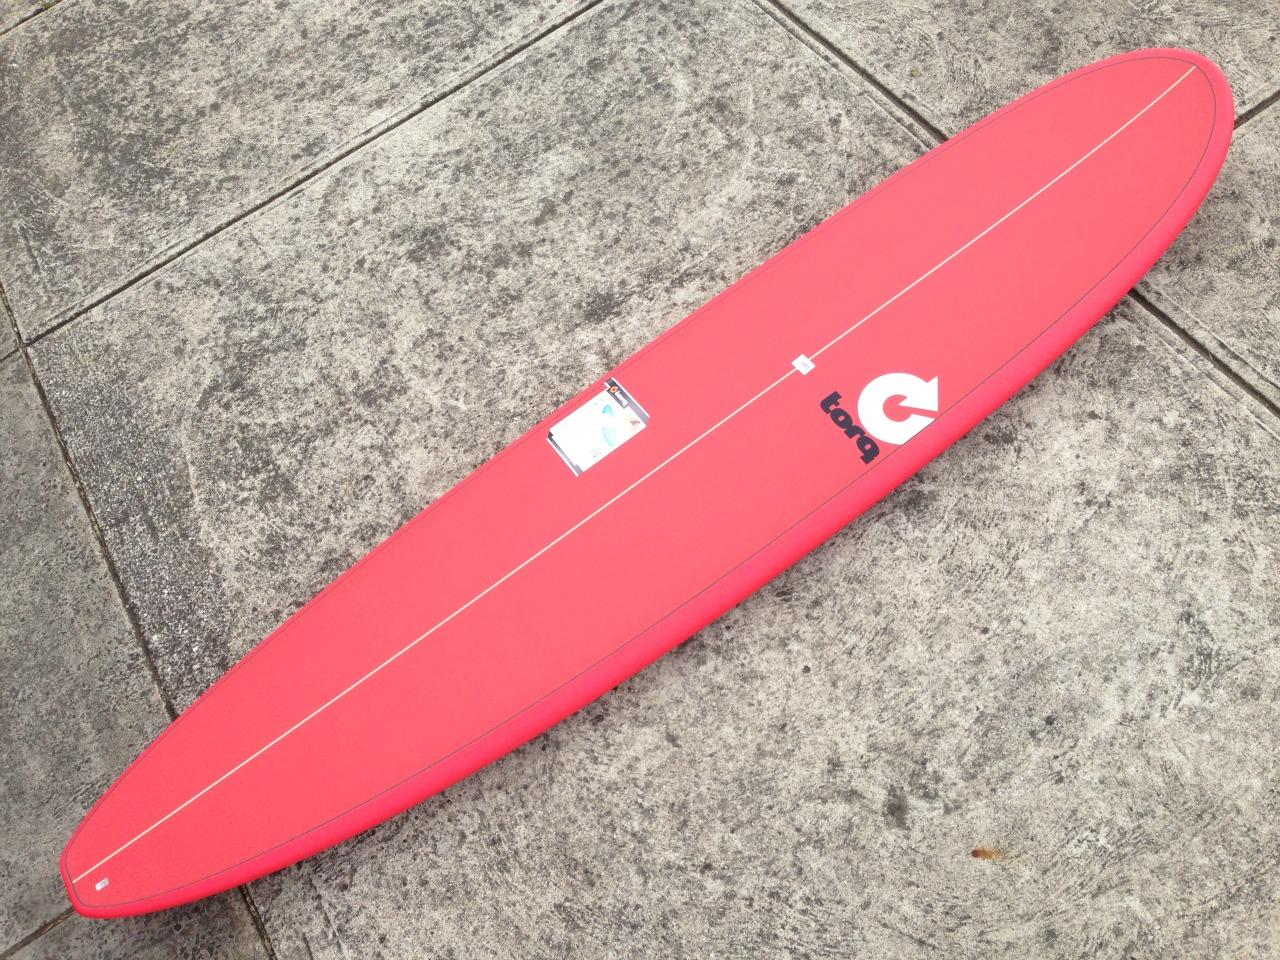 Torq Surfboards Range in store